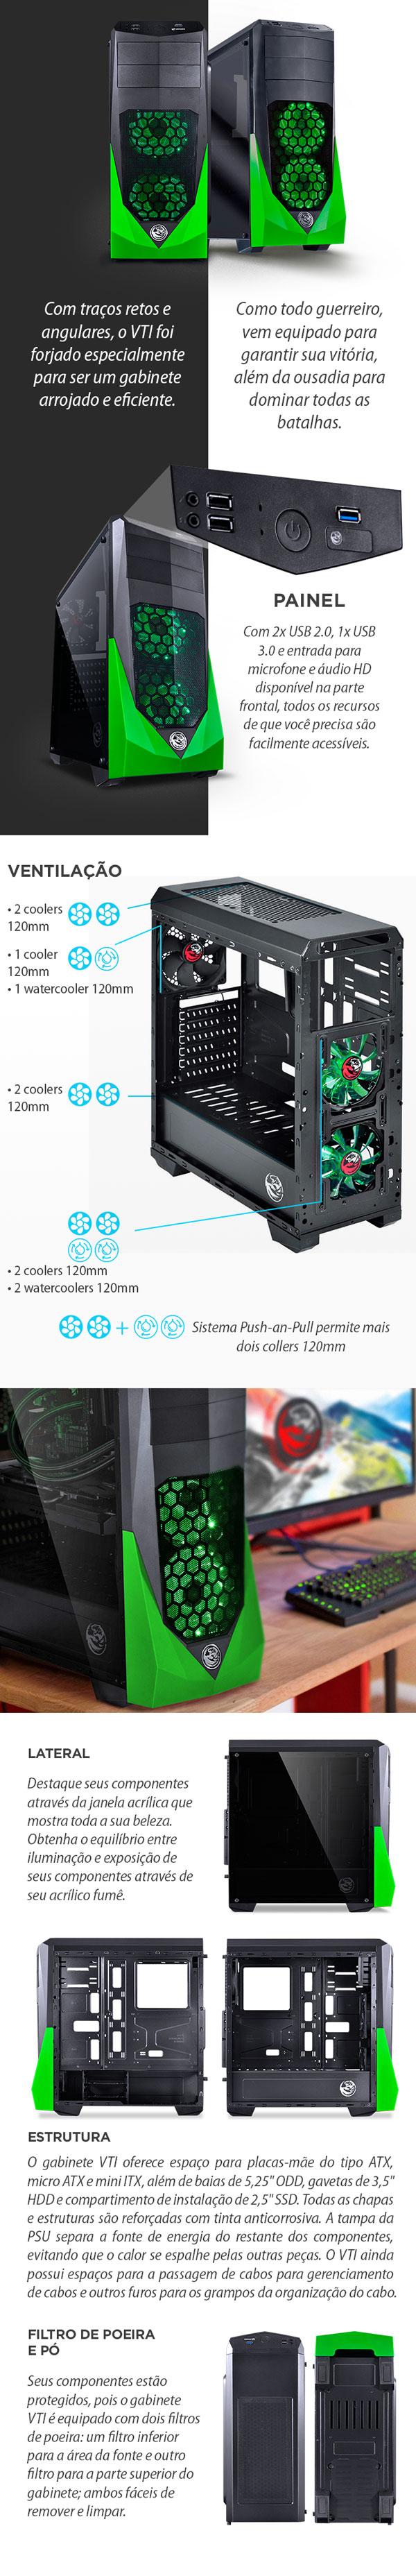 Gabinete gamer PCYES VTI preto e verde